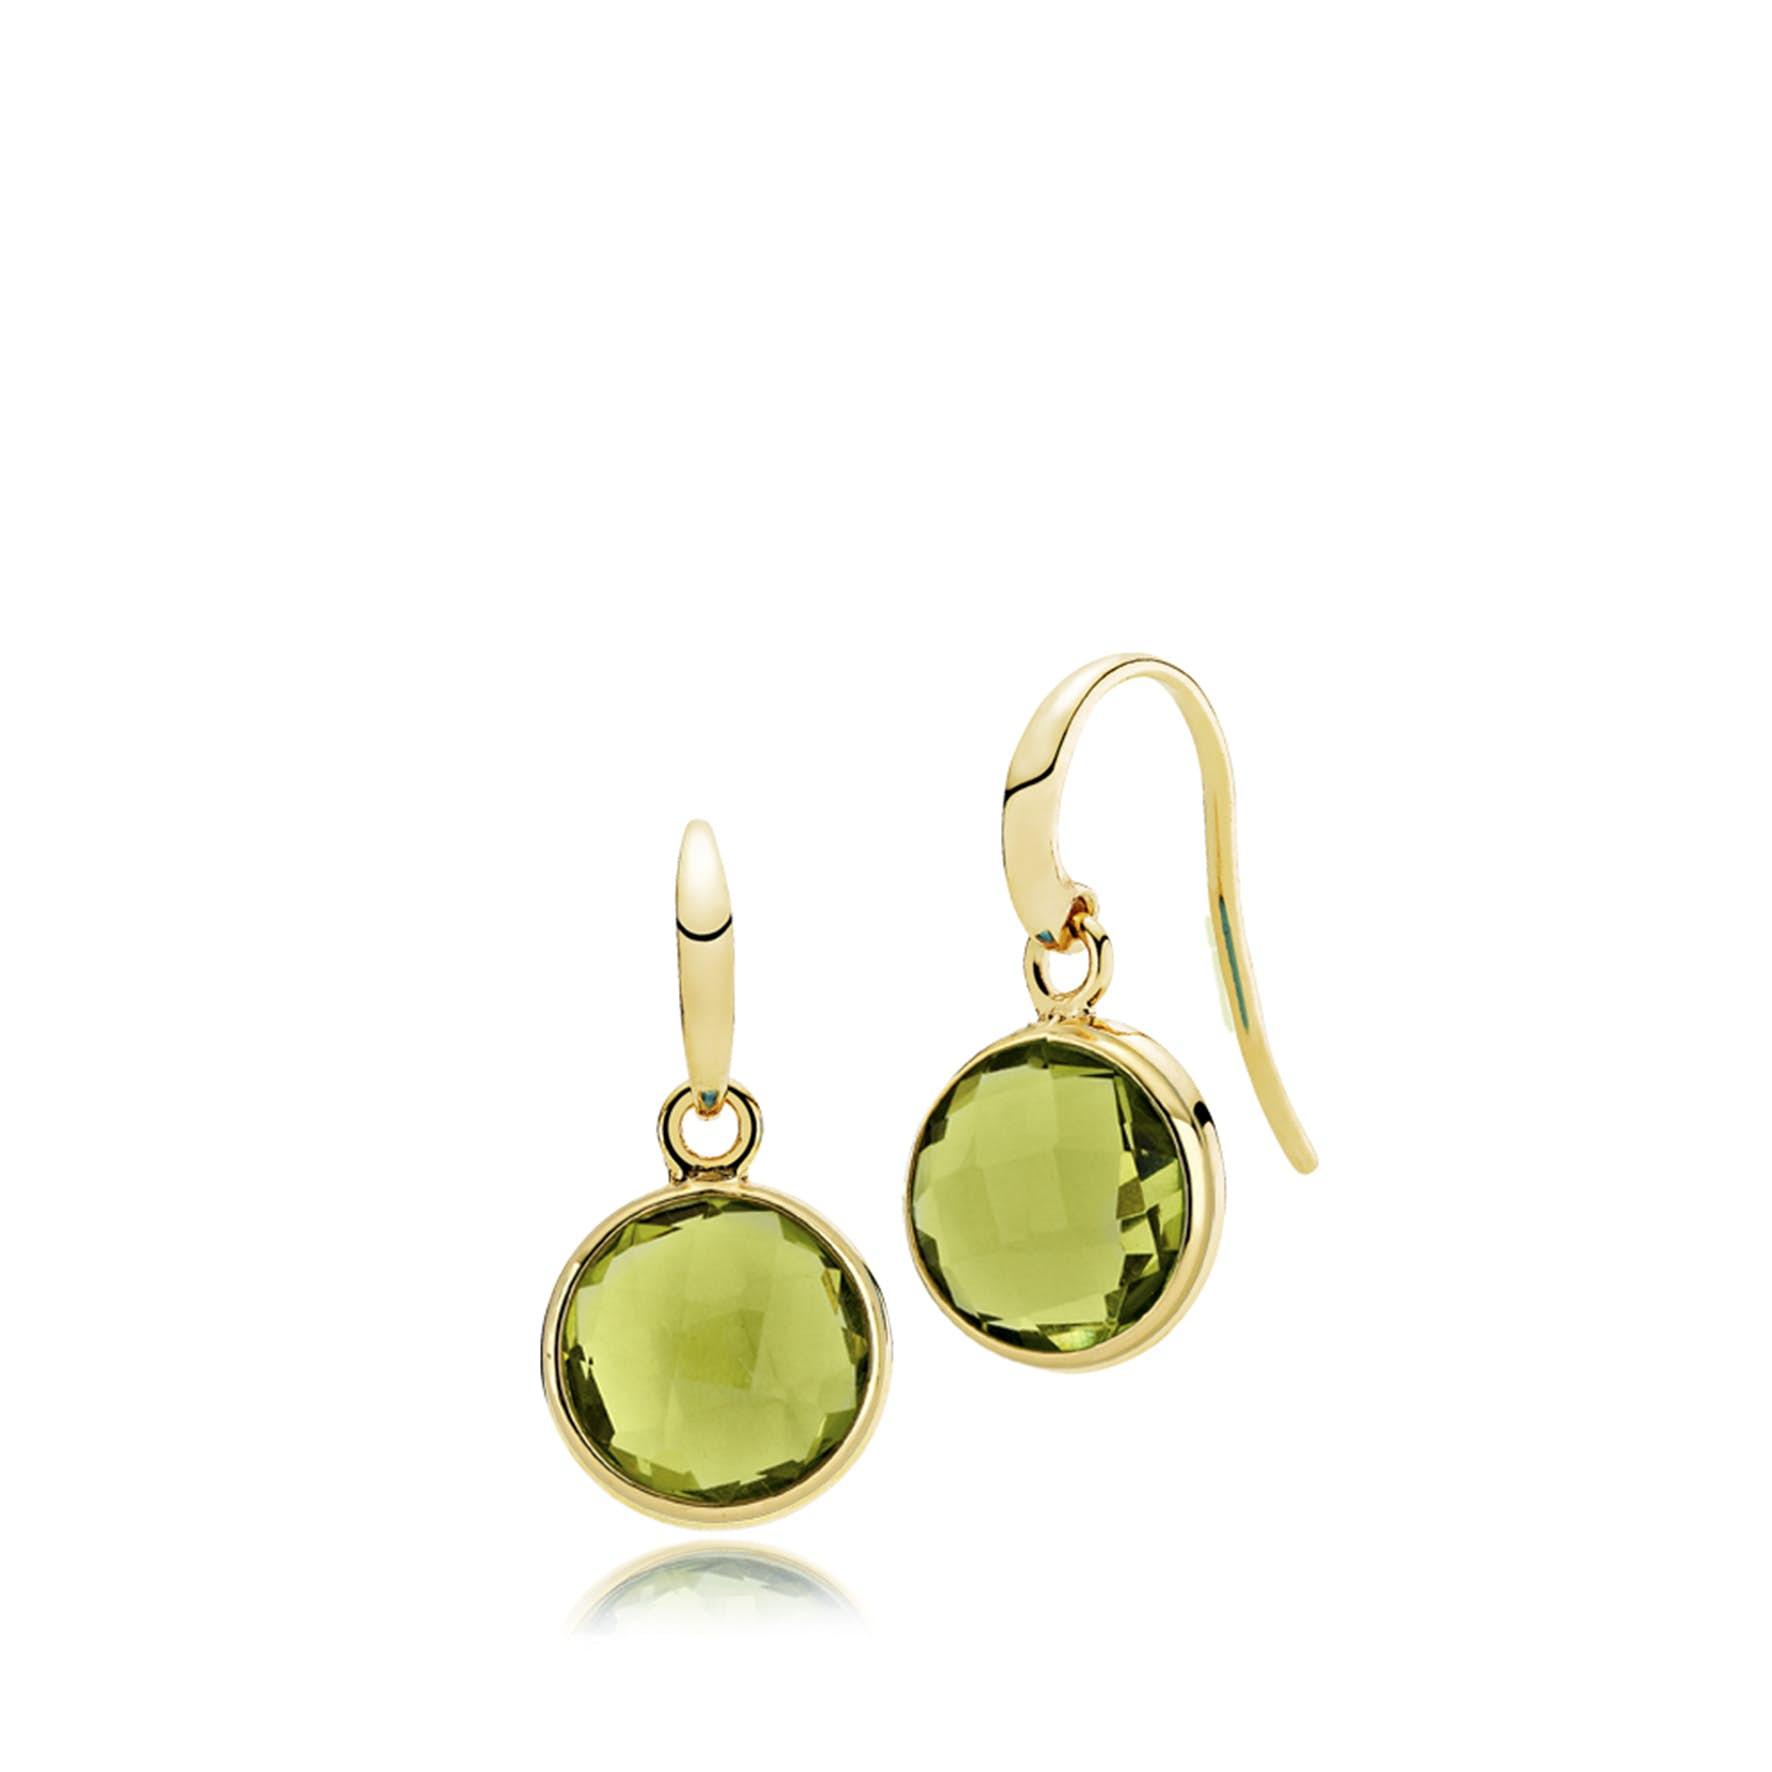 Prima Donna Earrings Peridot Green von Izabel Camille in Vergoldet-Silber Sterling 925 Peridot Green